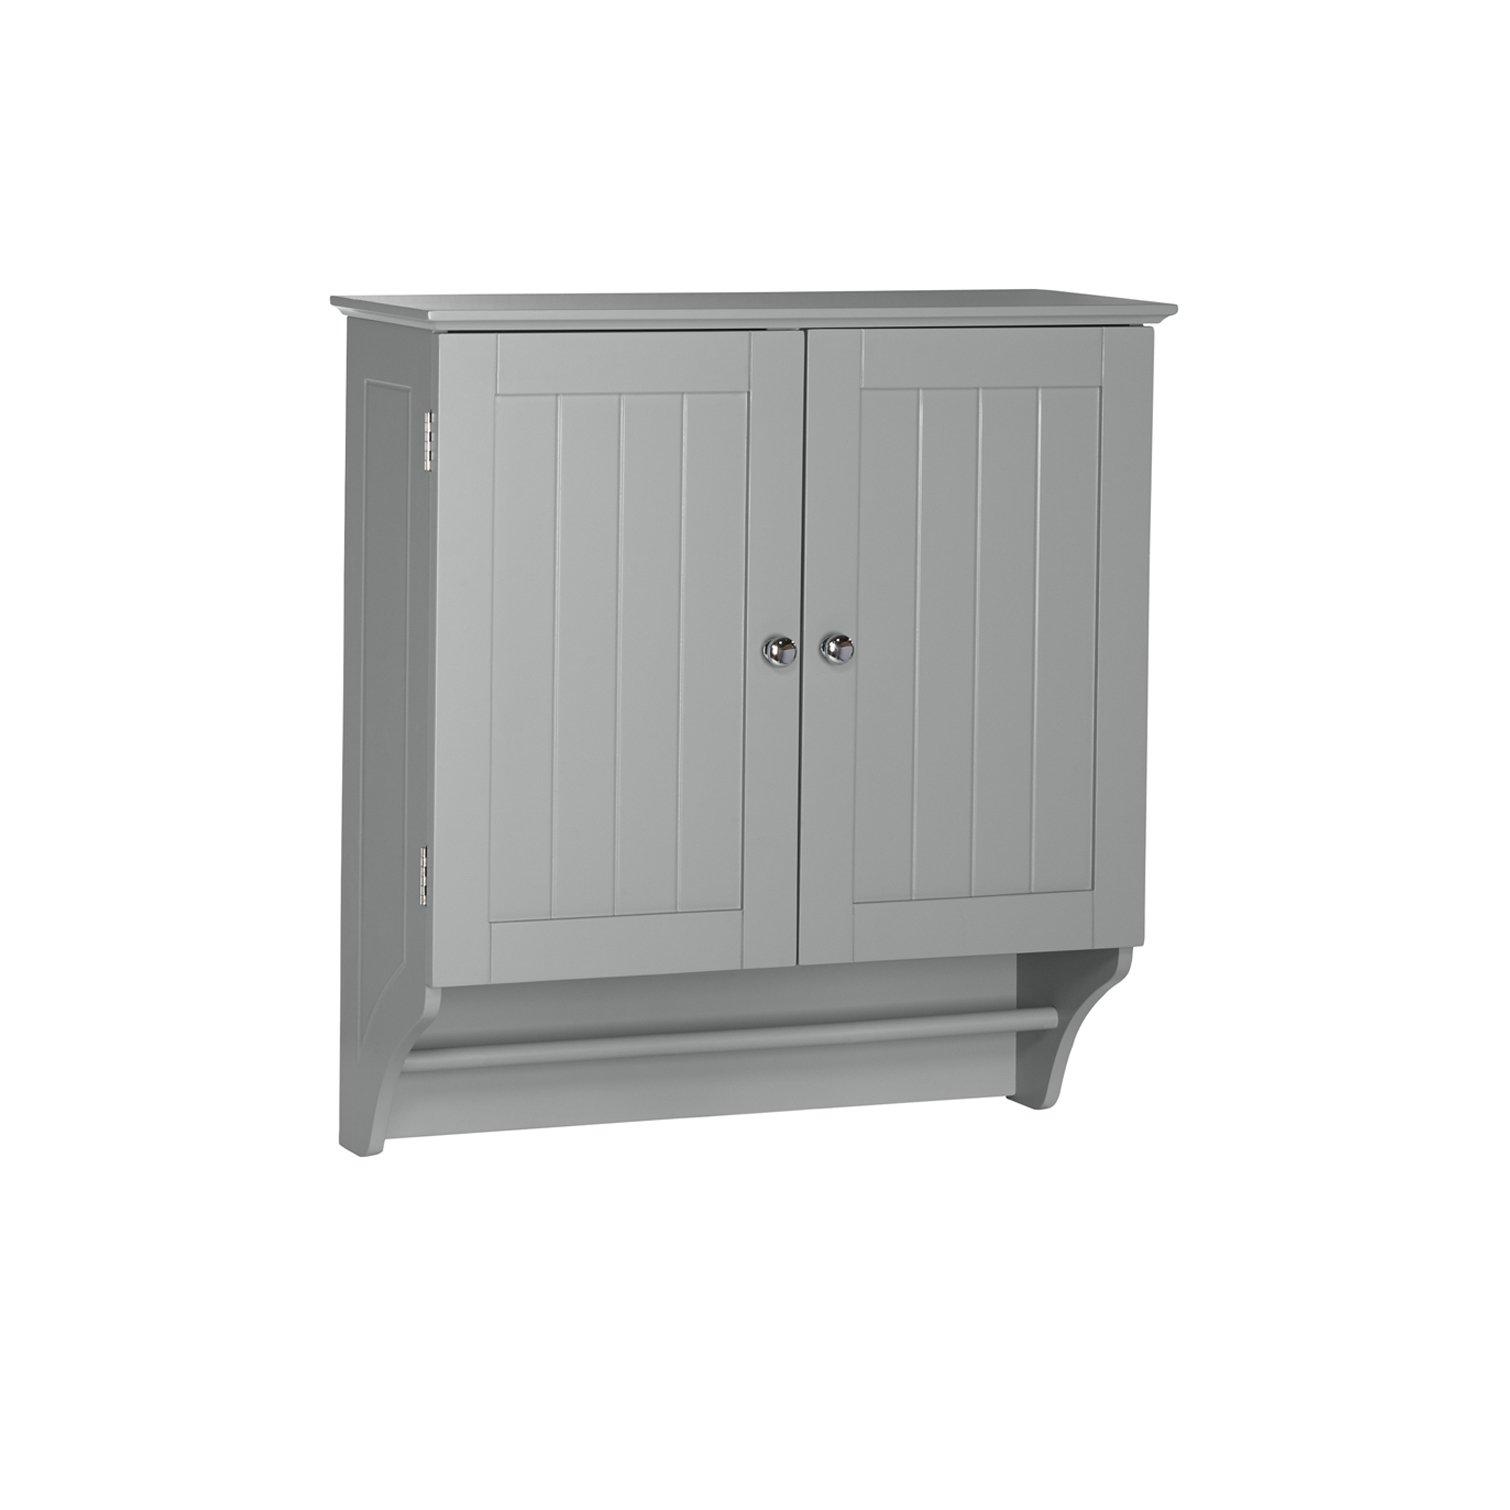 RiverRidge Ashland Collection Two-Door Wall Cabinet, Gray by RiverRidge Home